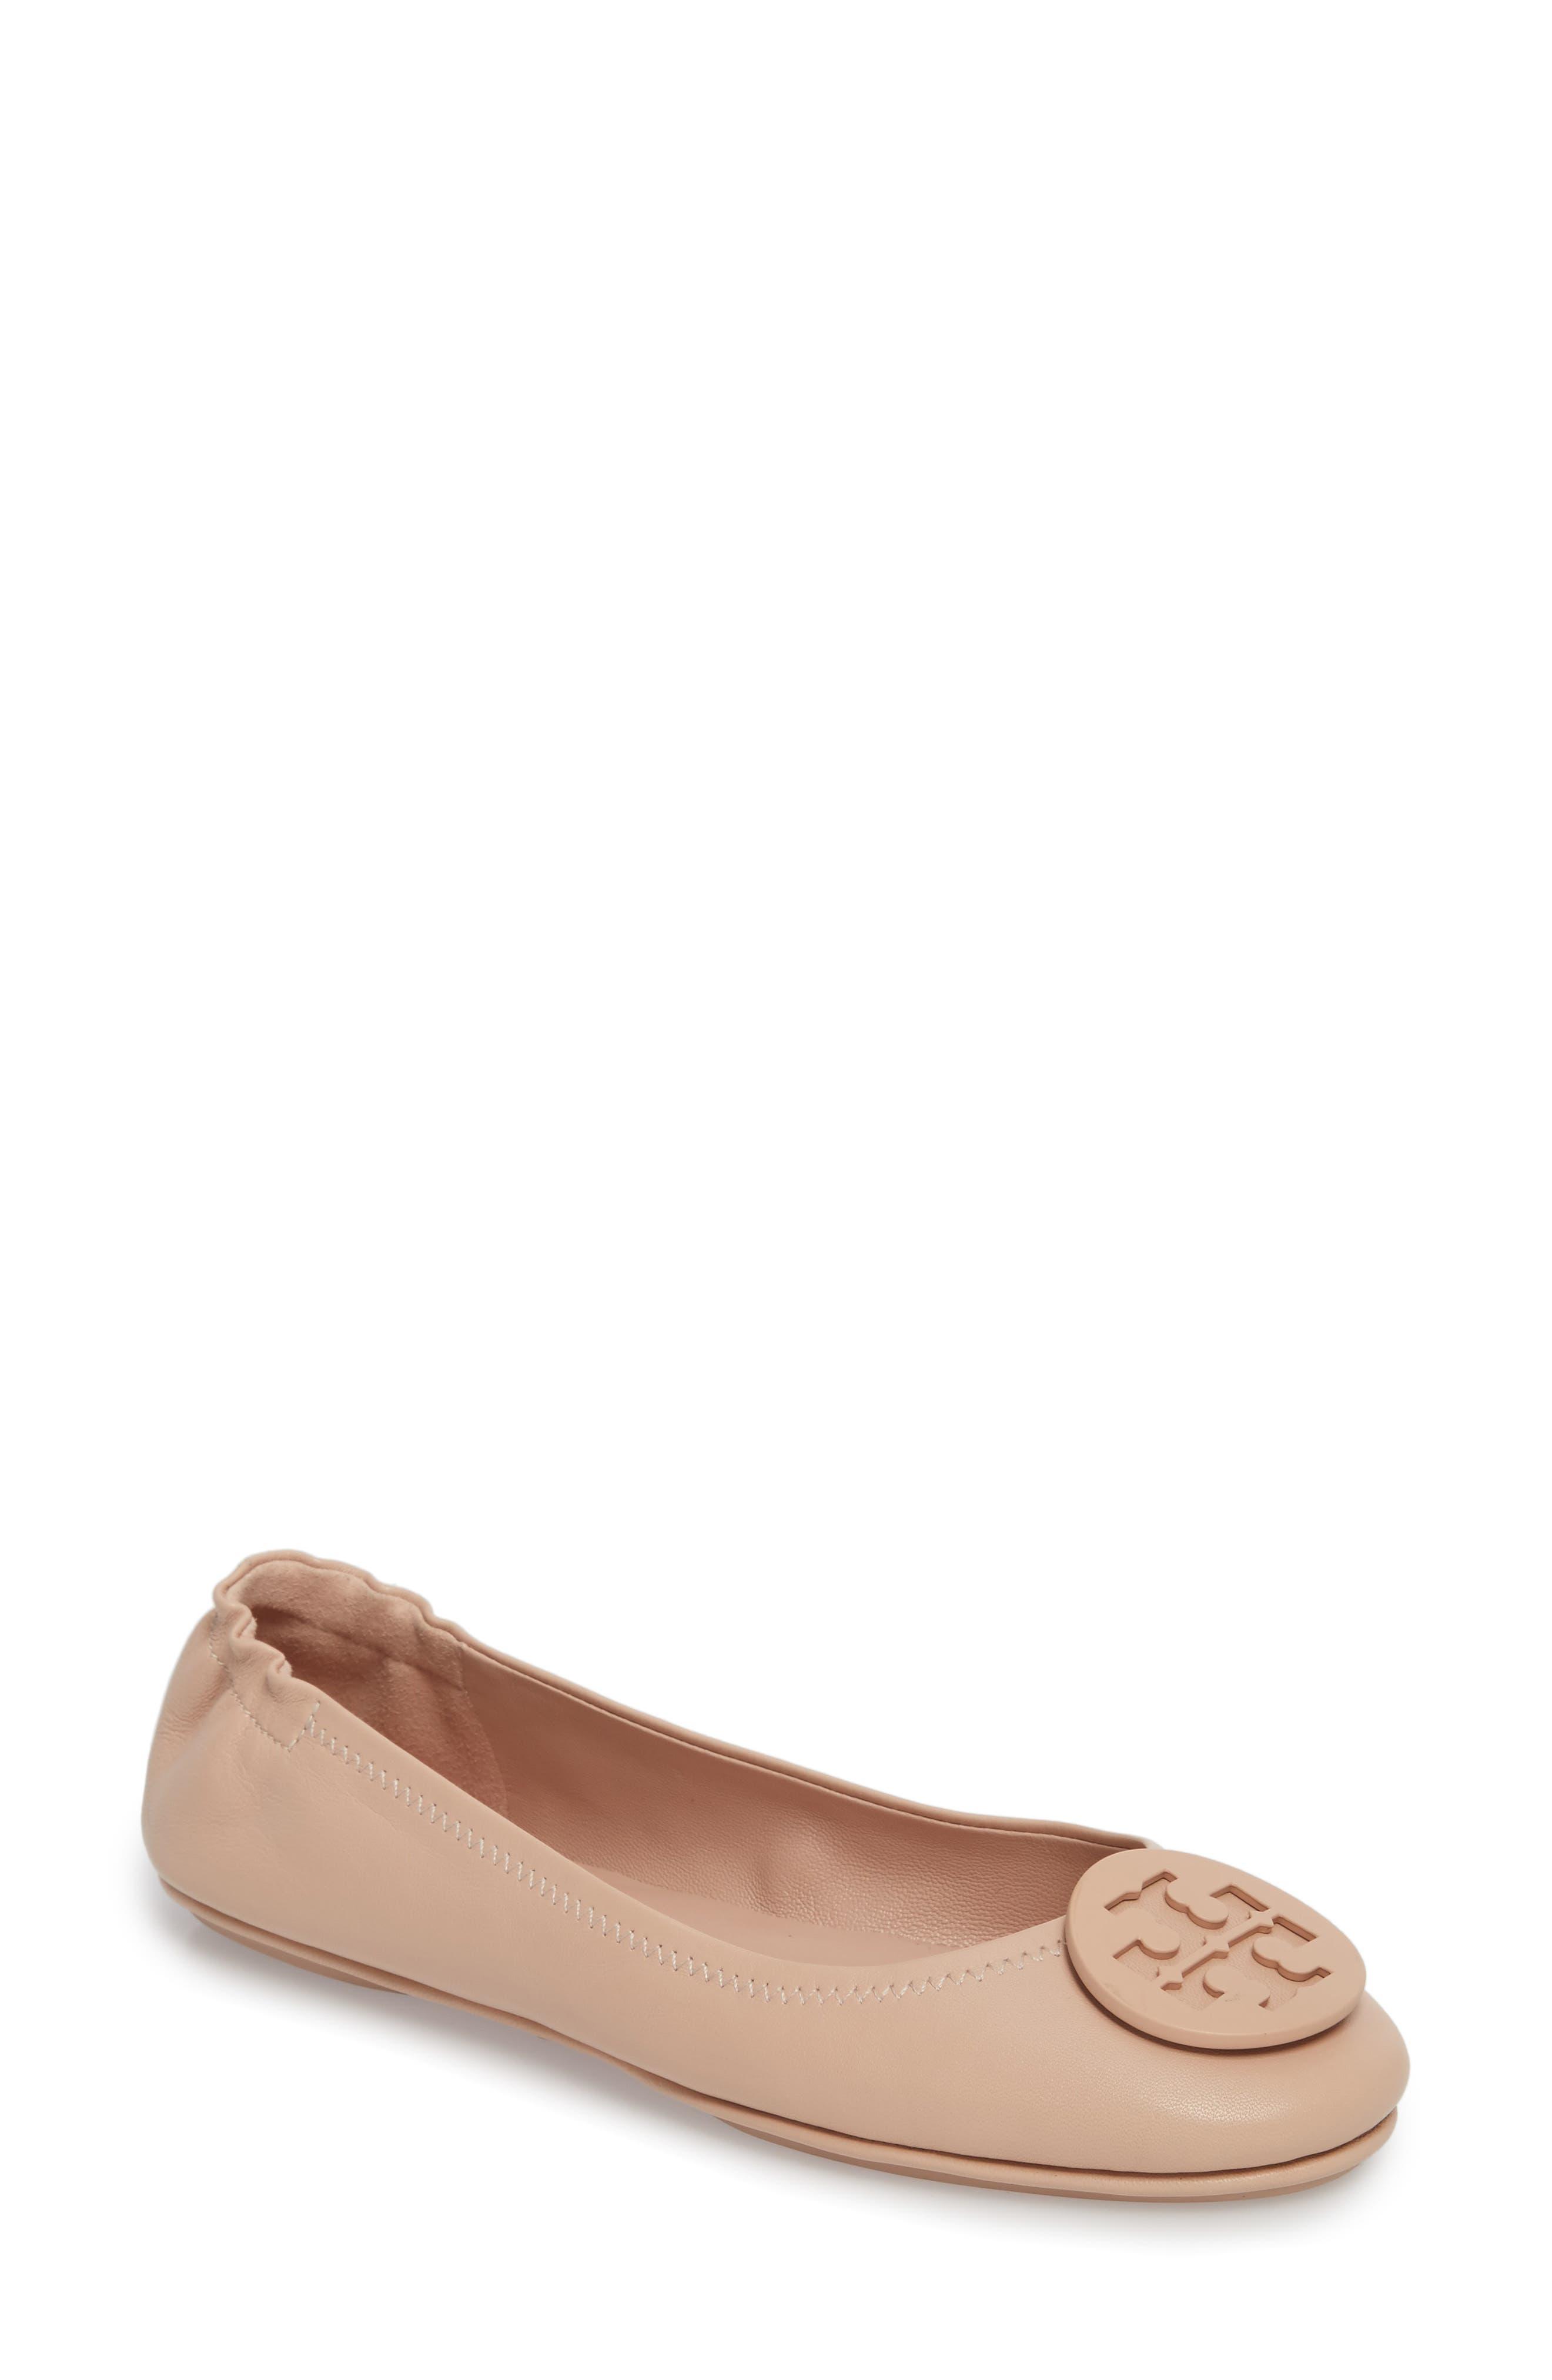 Women'S Minnie Leather Travel Ballet Flats in Goan Sand